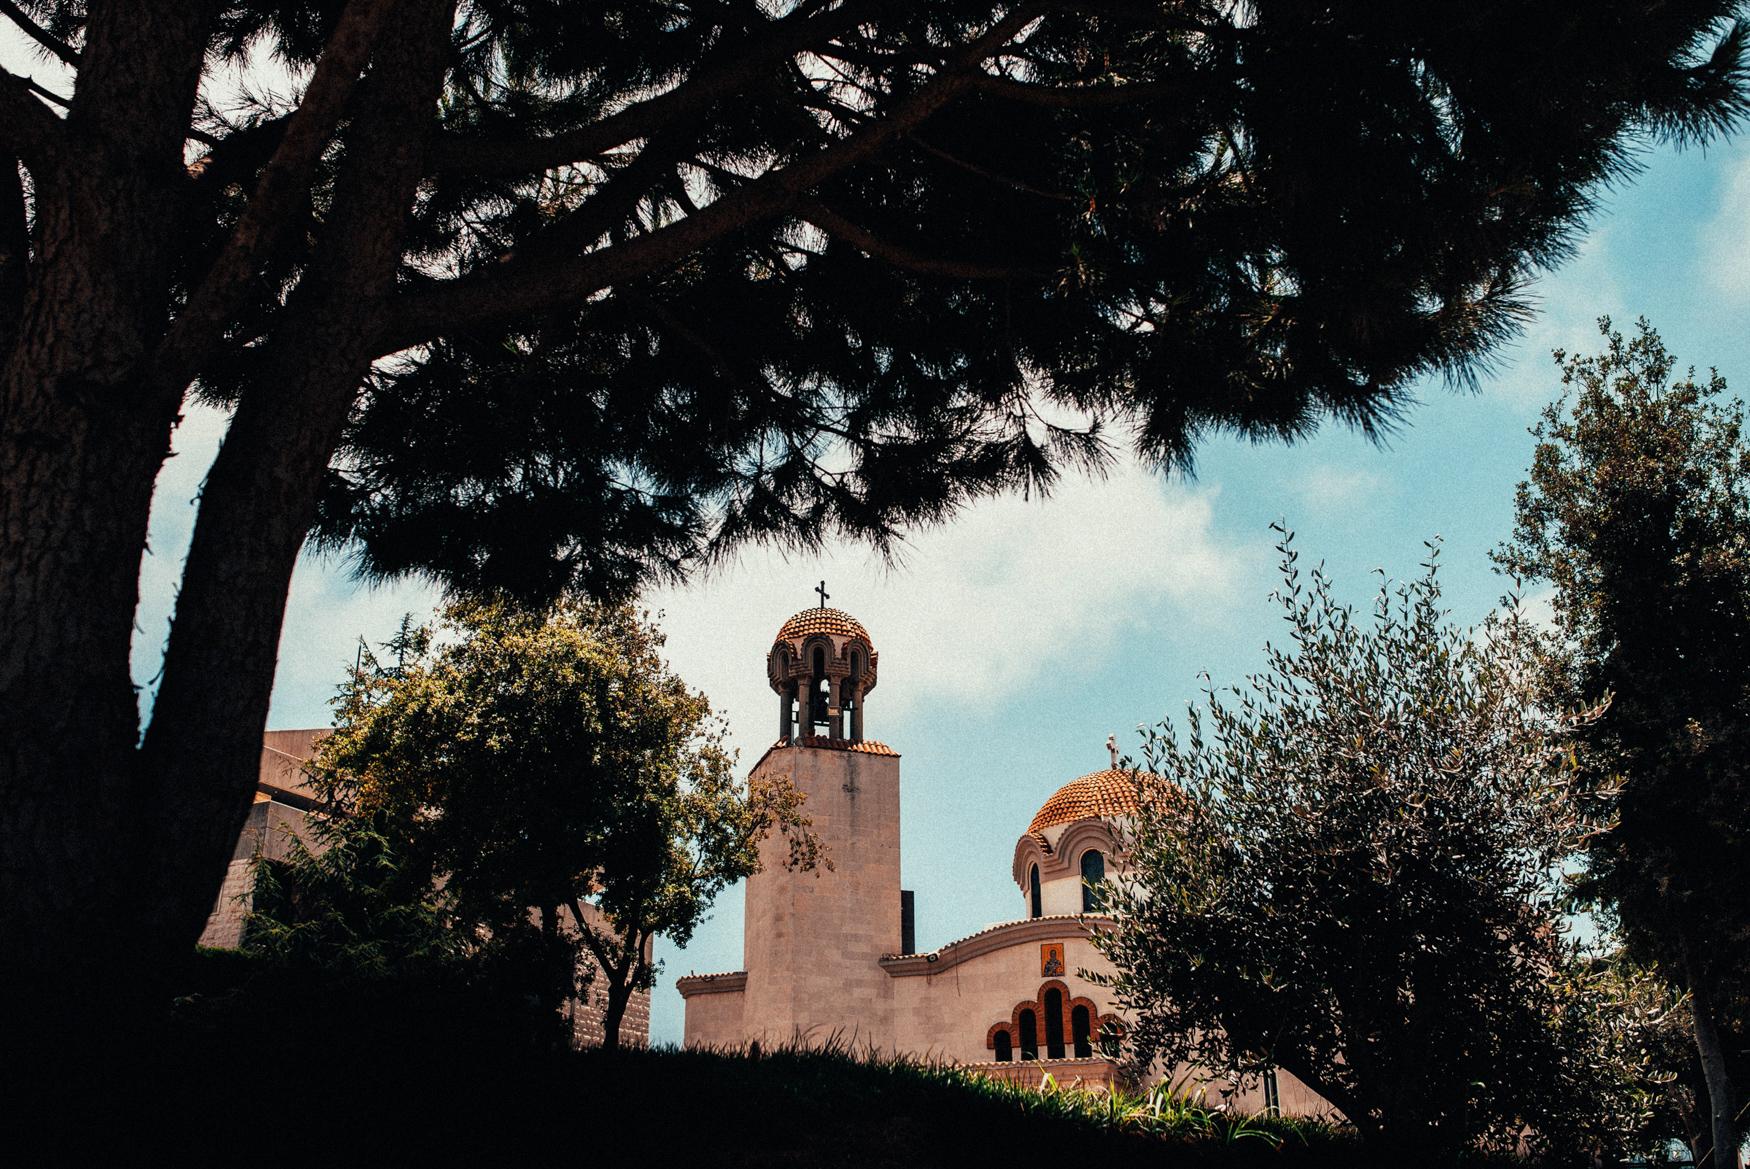 LR2 beirut byblos wedding photographer lebanon 033.jpg